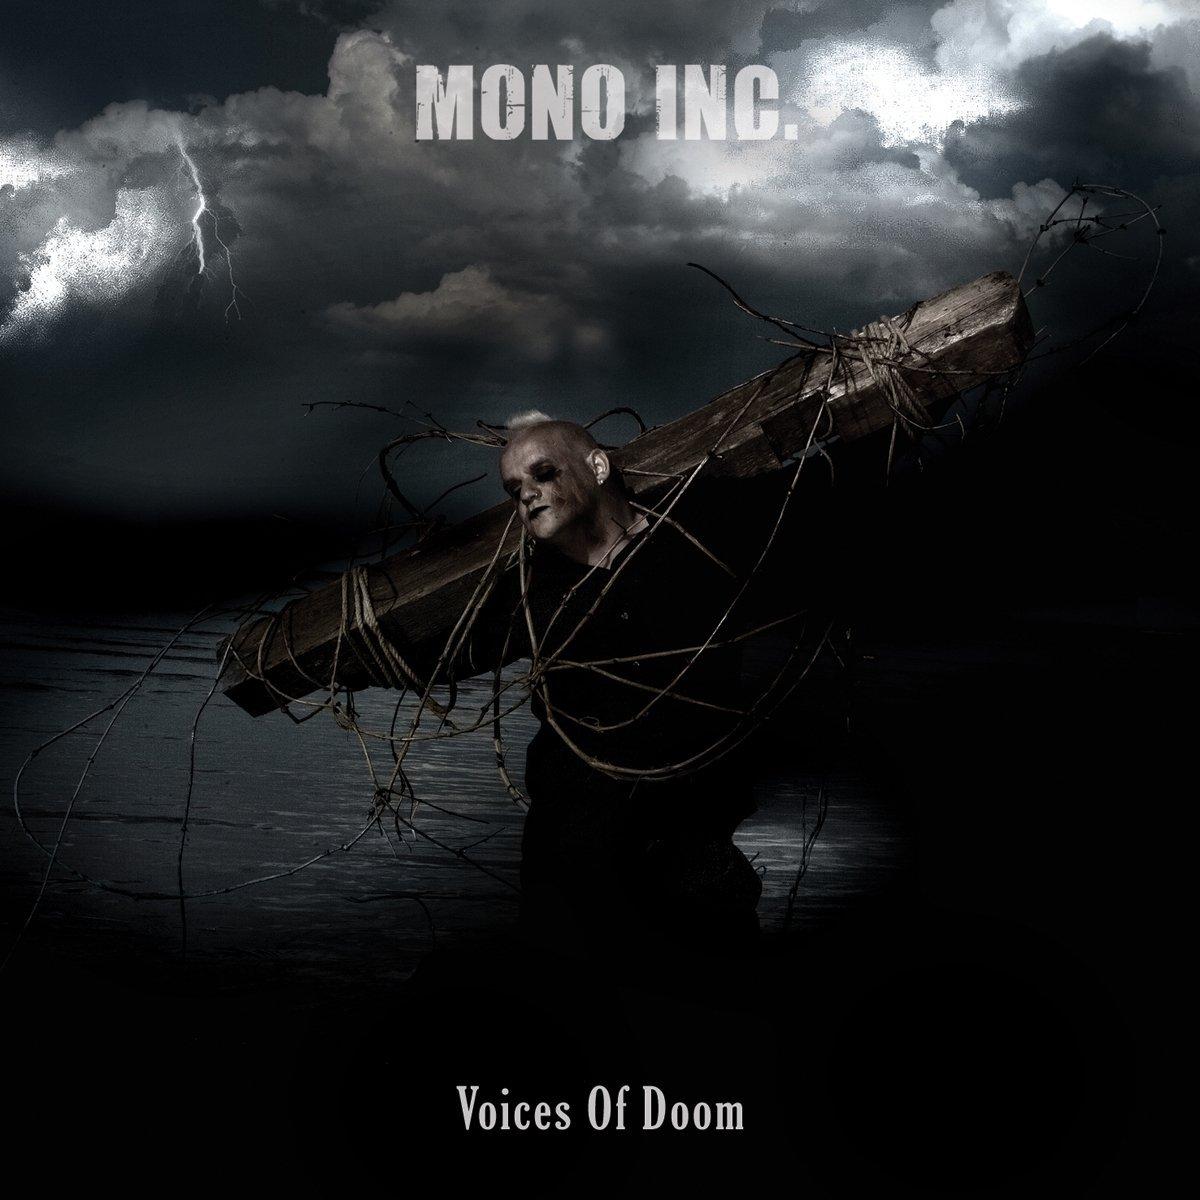 Mono Inc.: Voices of Doom (2009) Book Cover